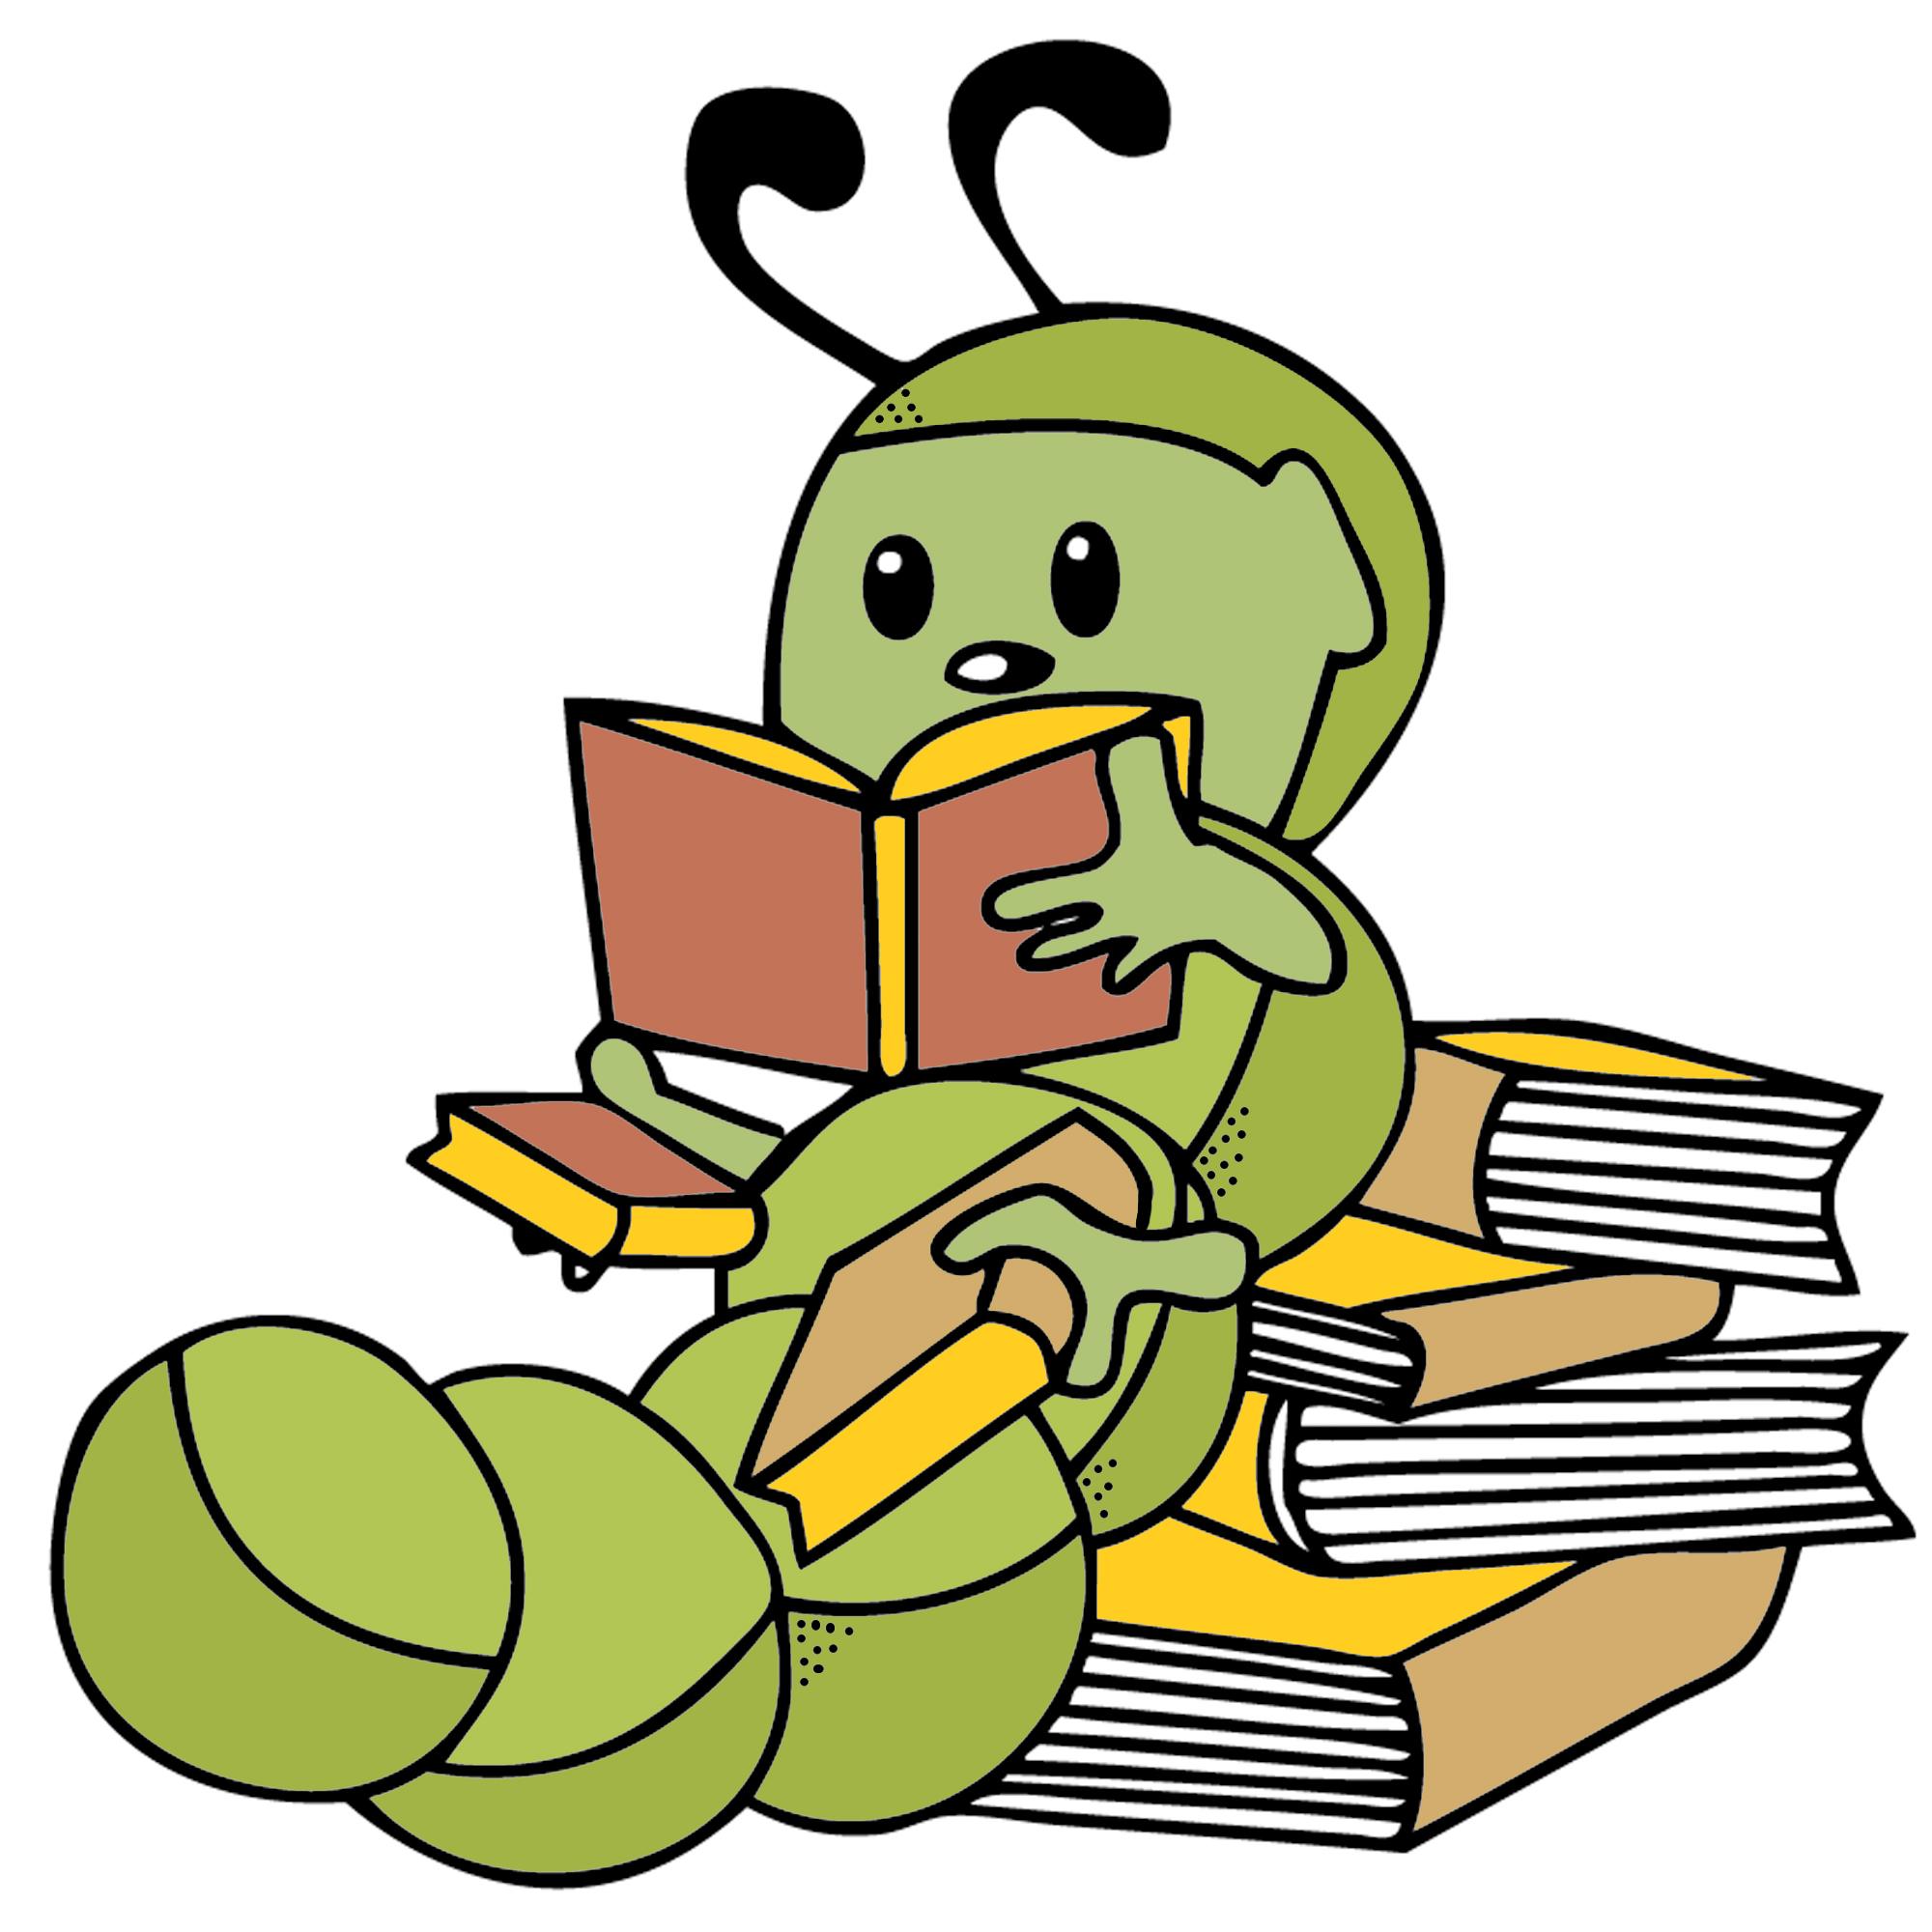 Free Bookworm Cliparts, Download Free Clip Art, Free Clip.